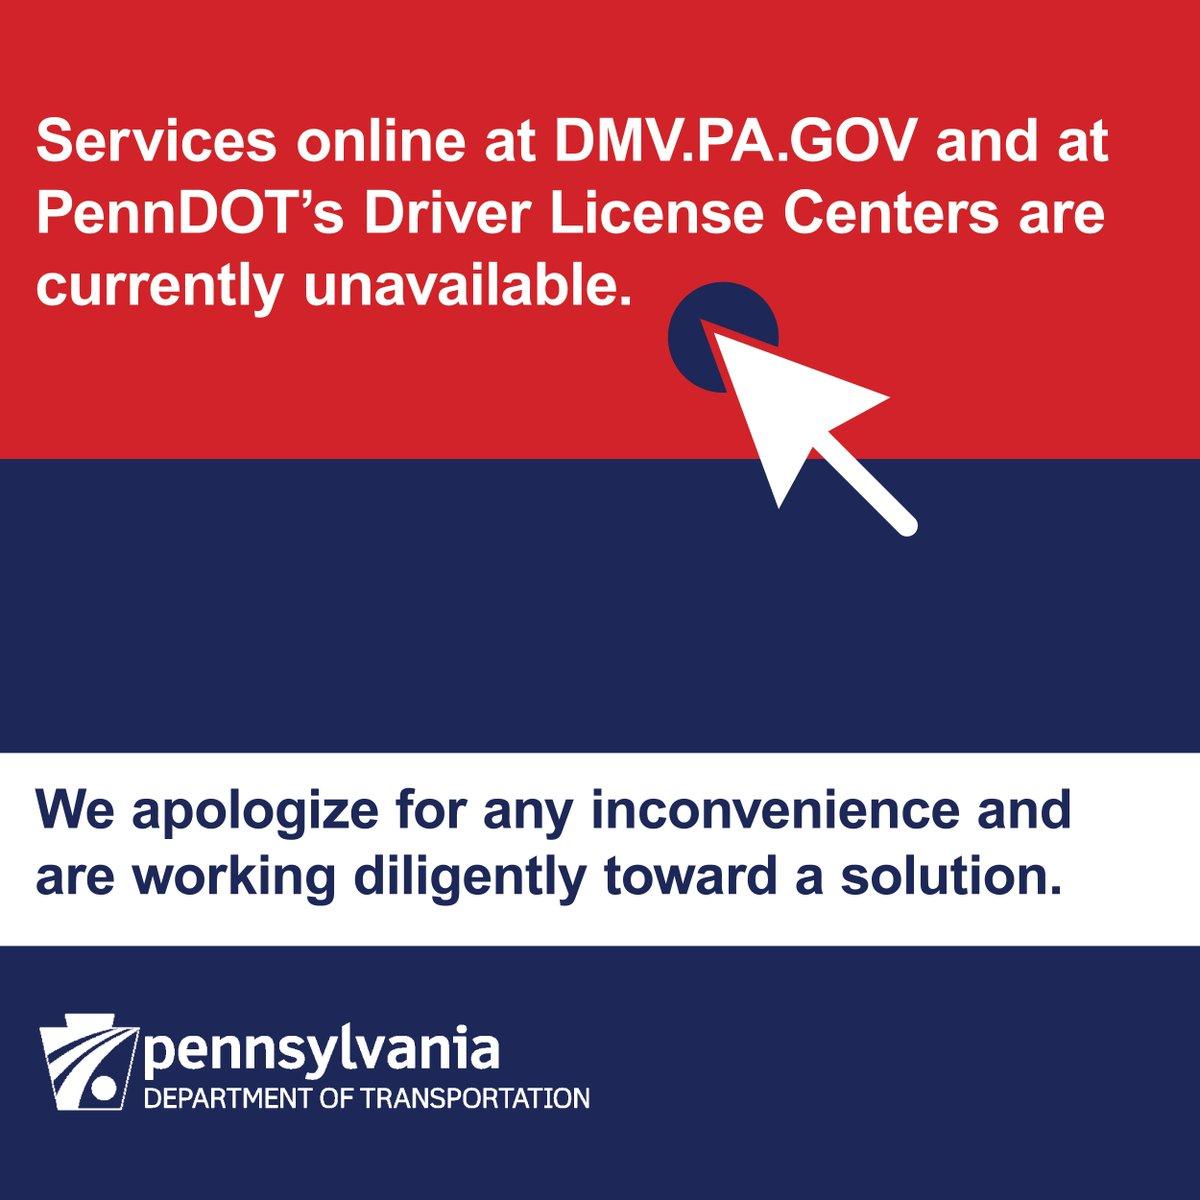 penn dot drivers license centers